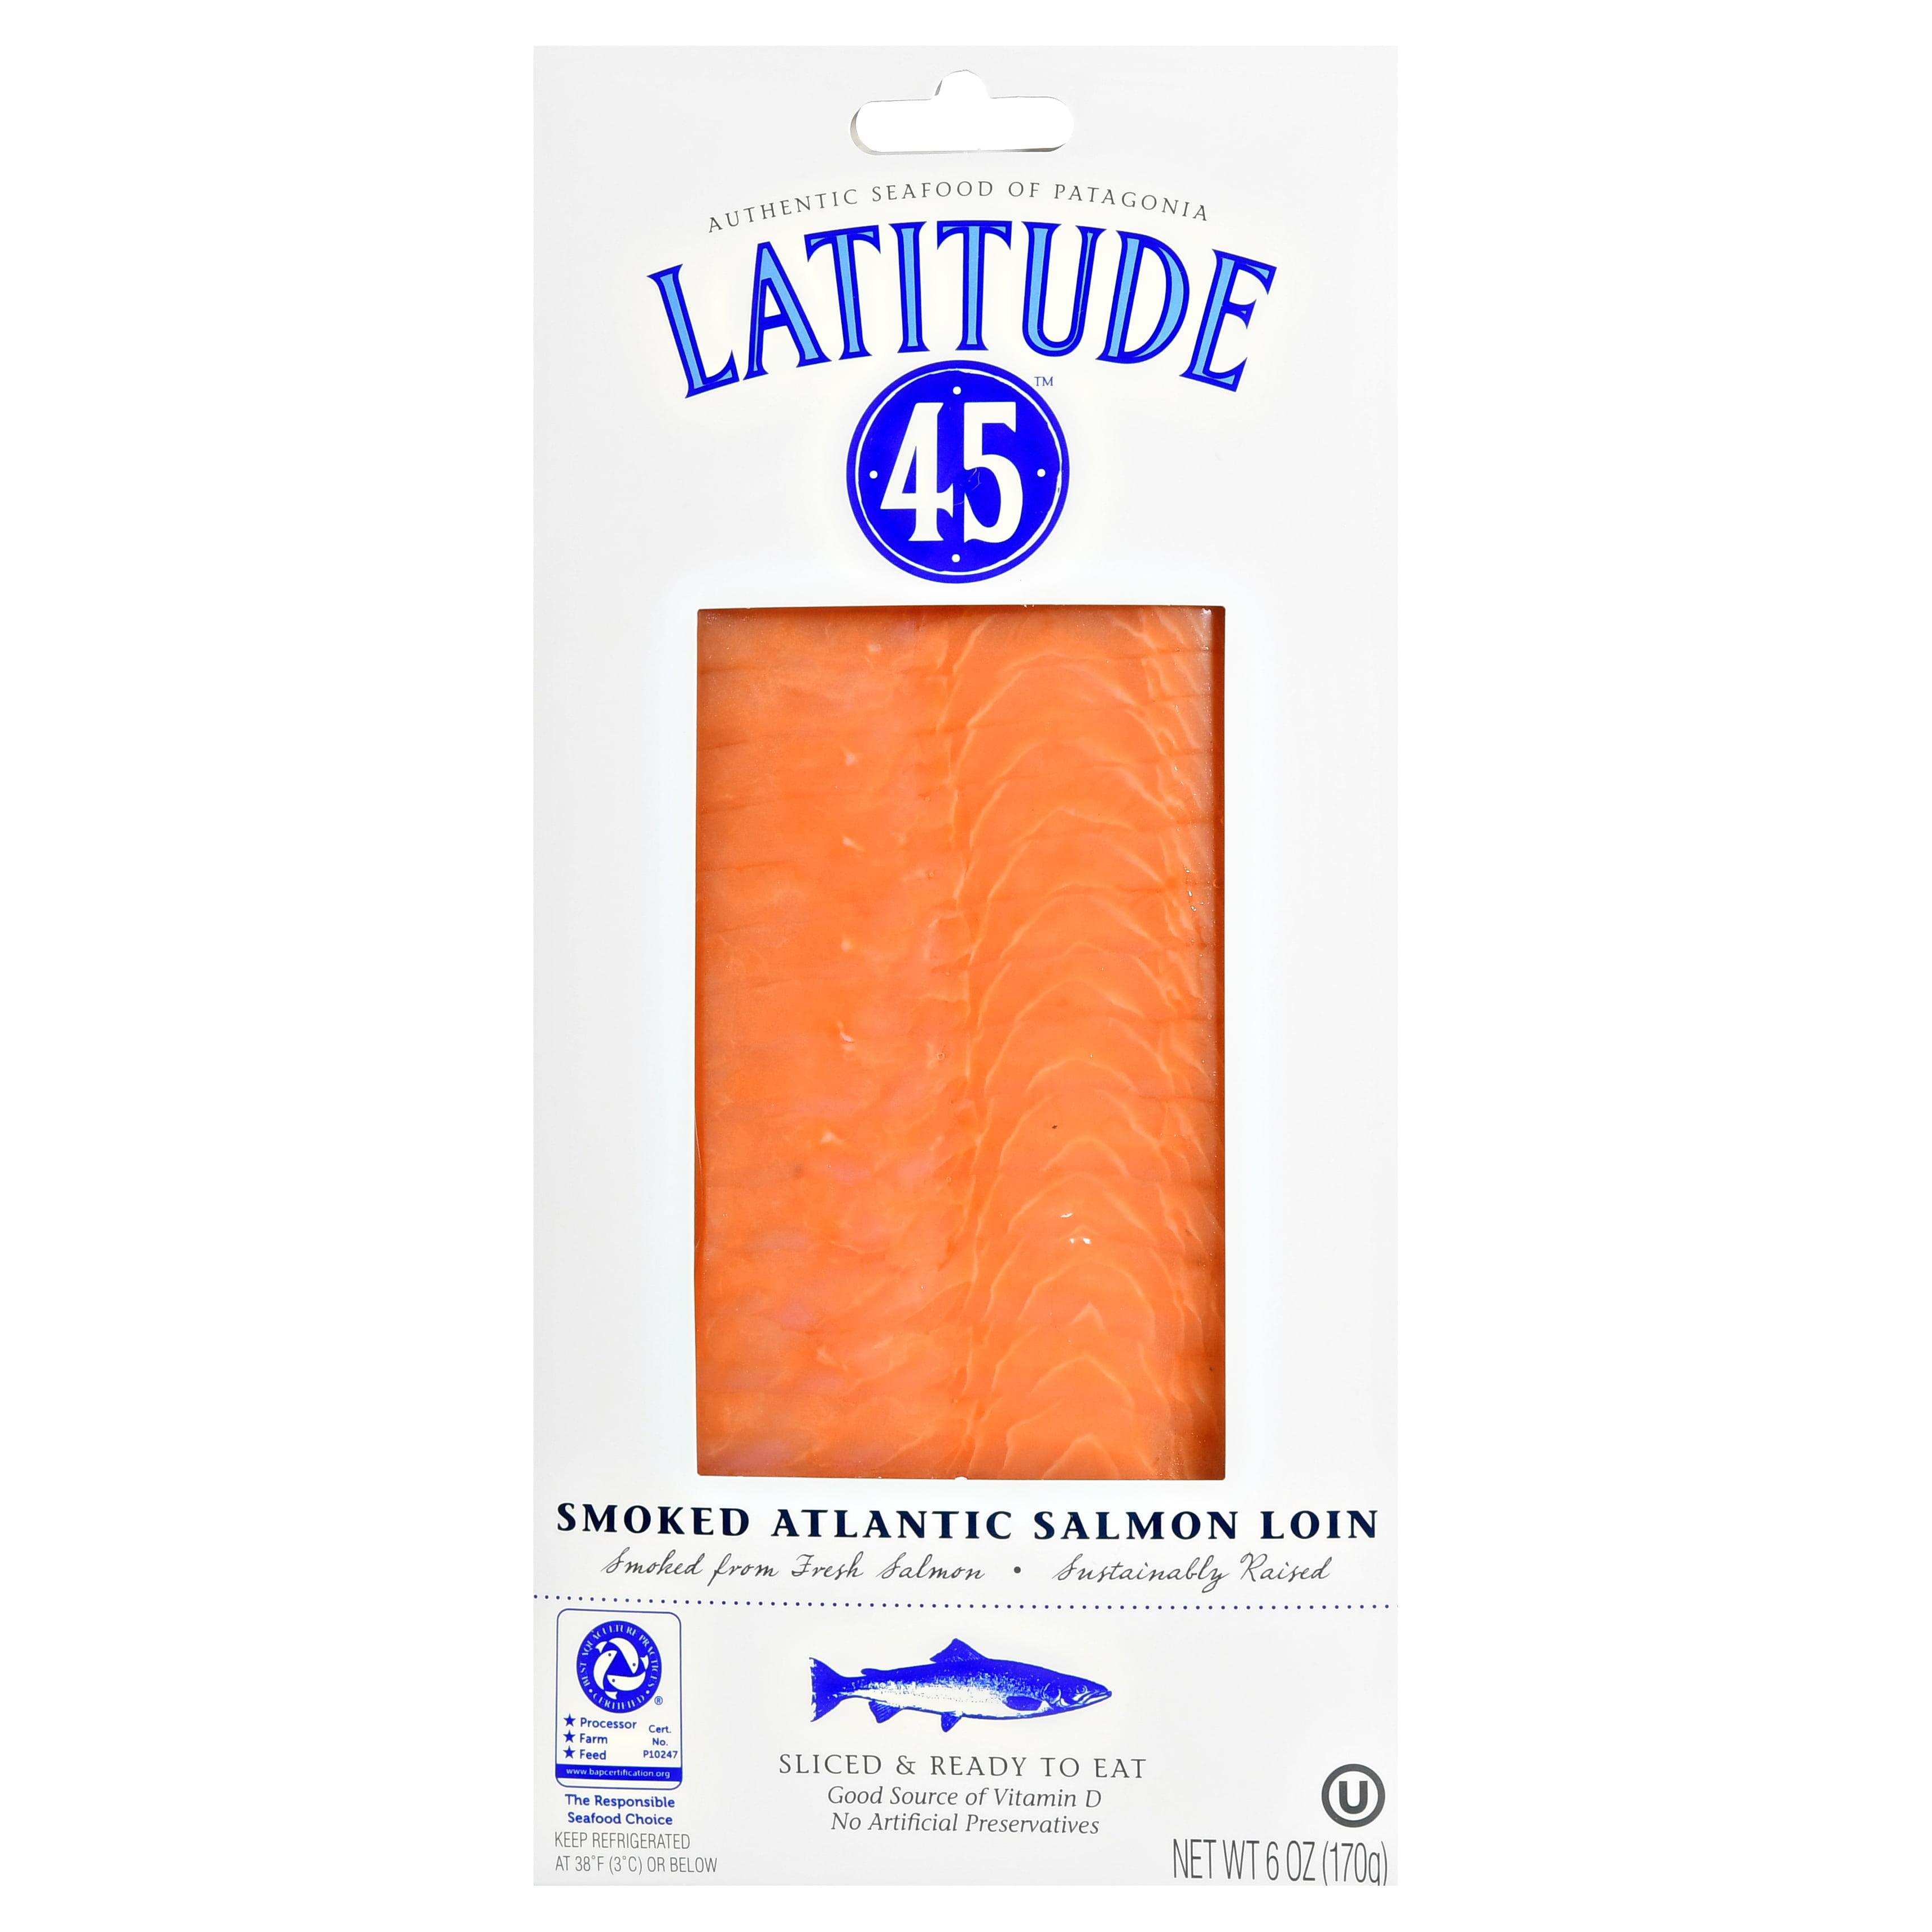 Latitude 45 Smoked Atlantic Salmon Loin 6oz